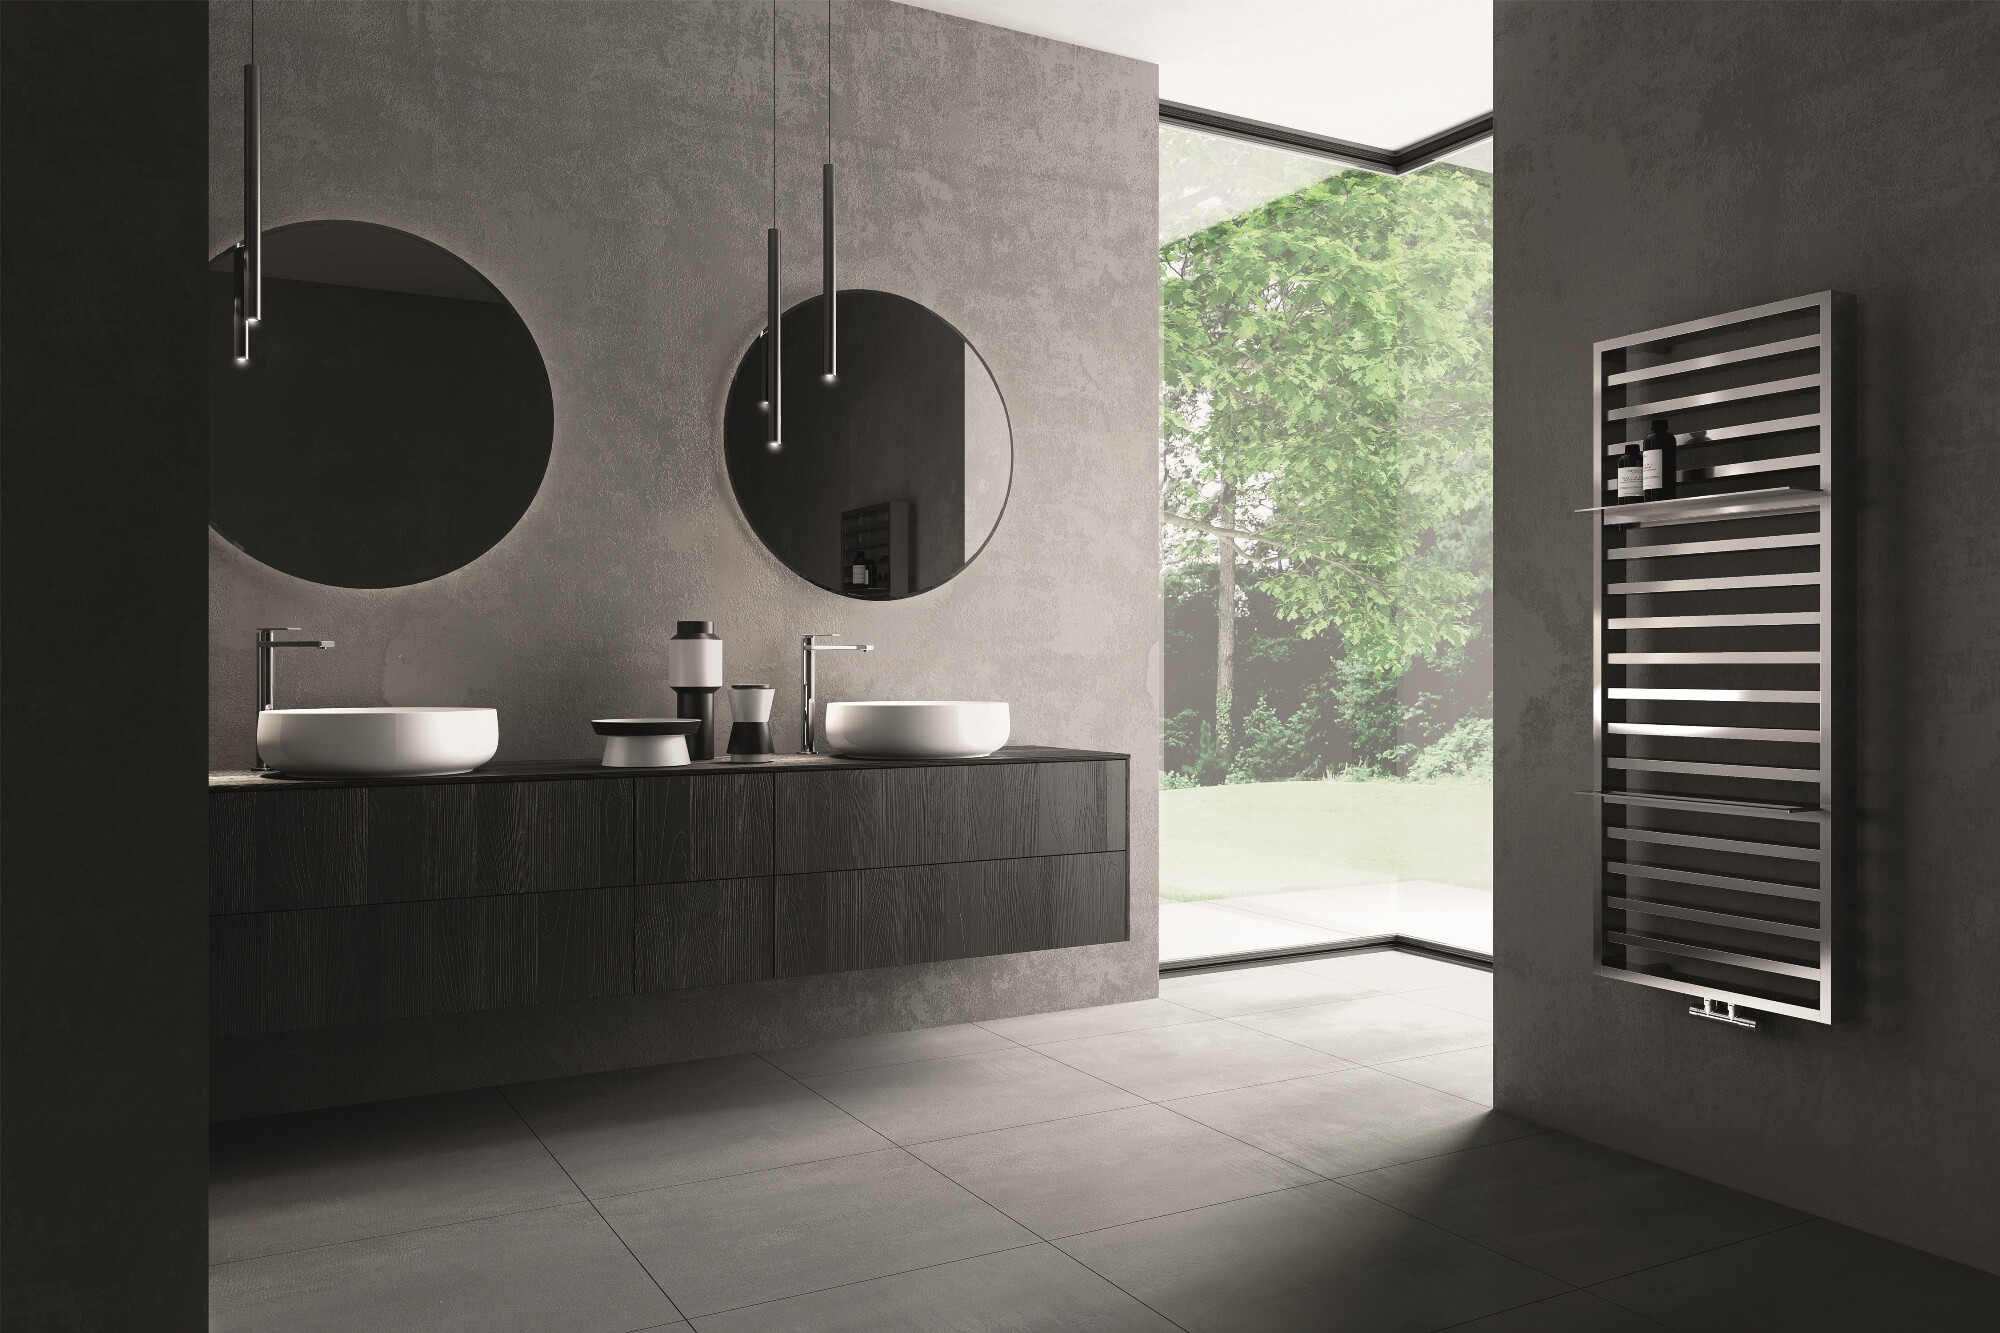 It Is, design radiator for bathroom